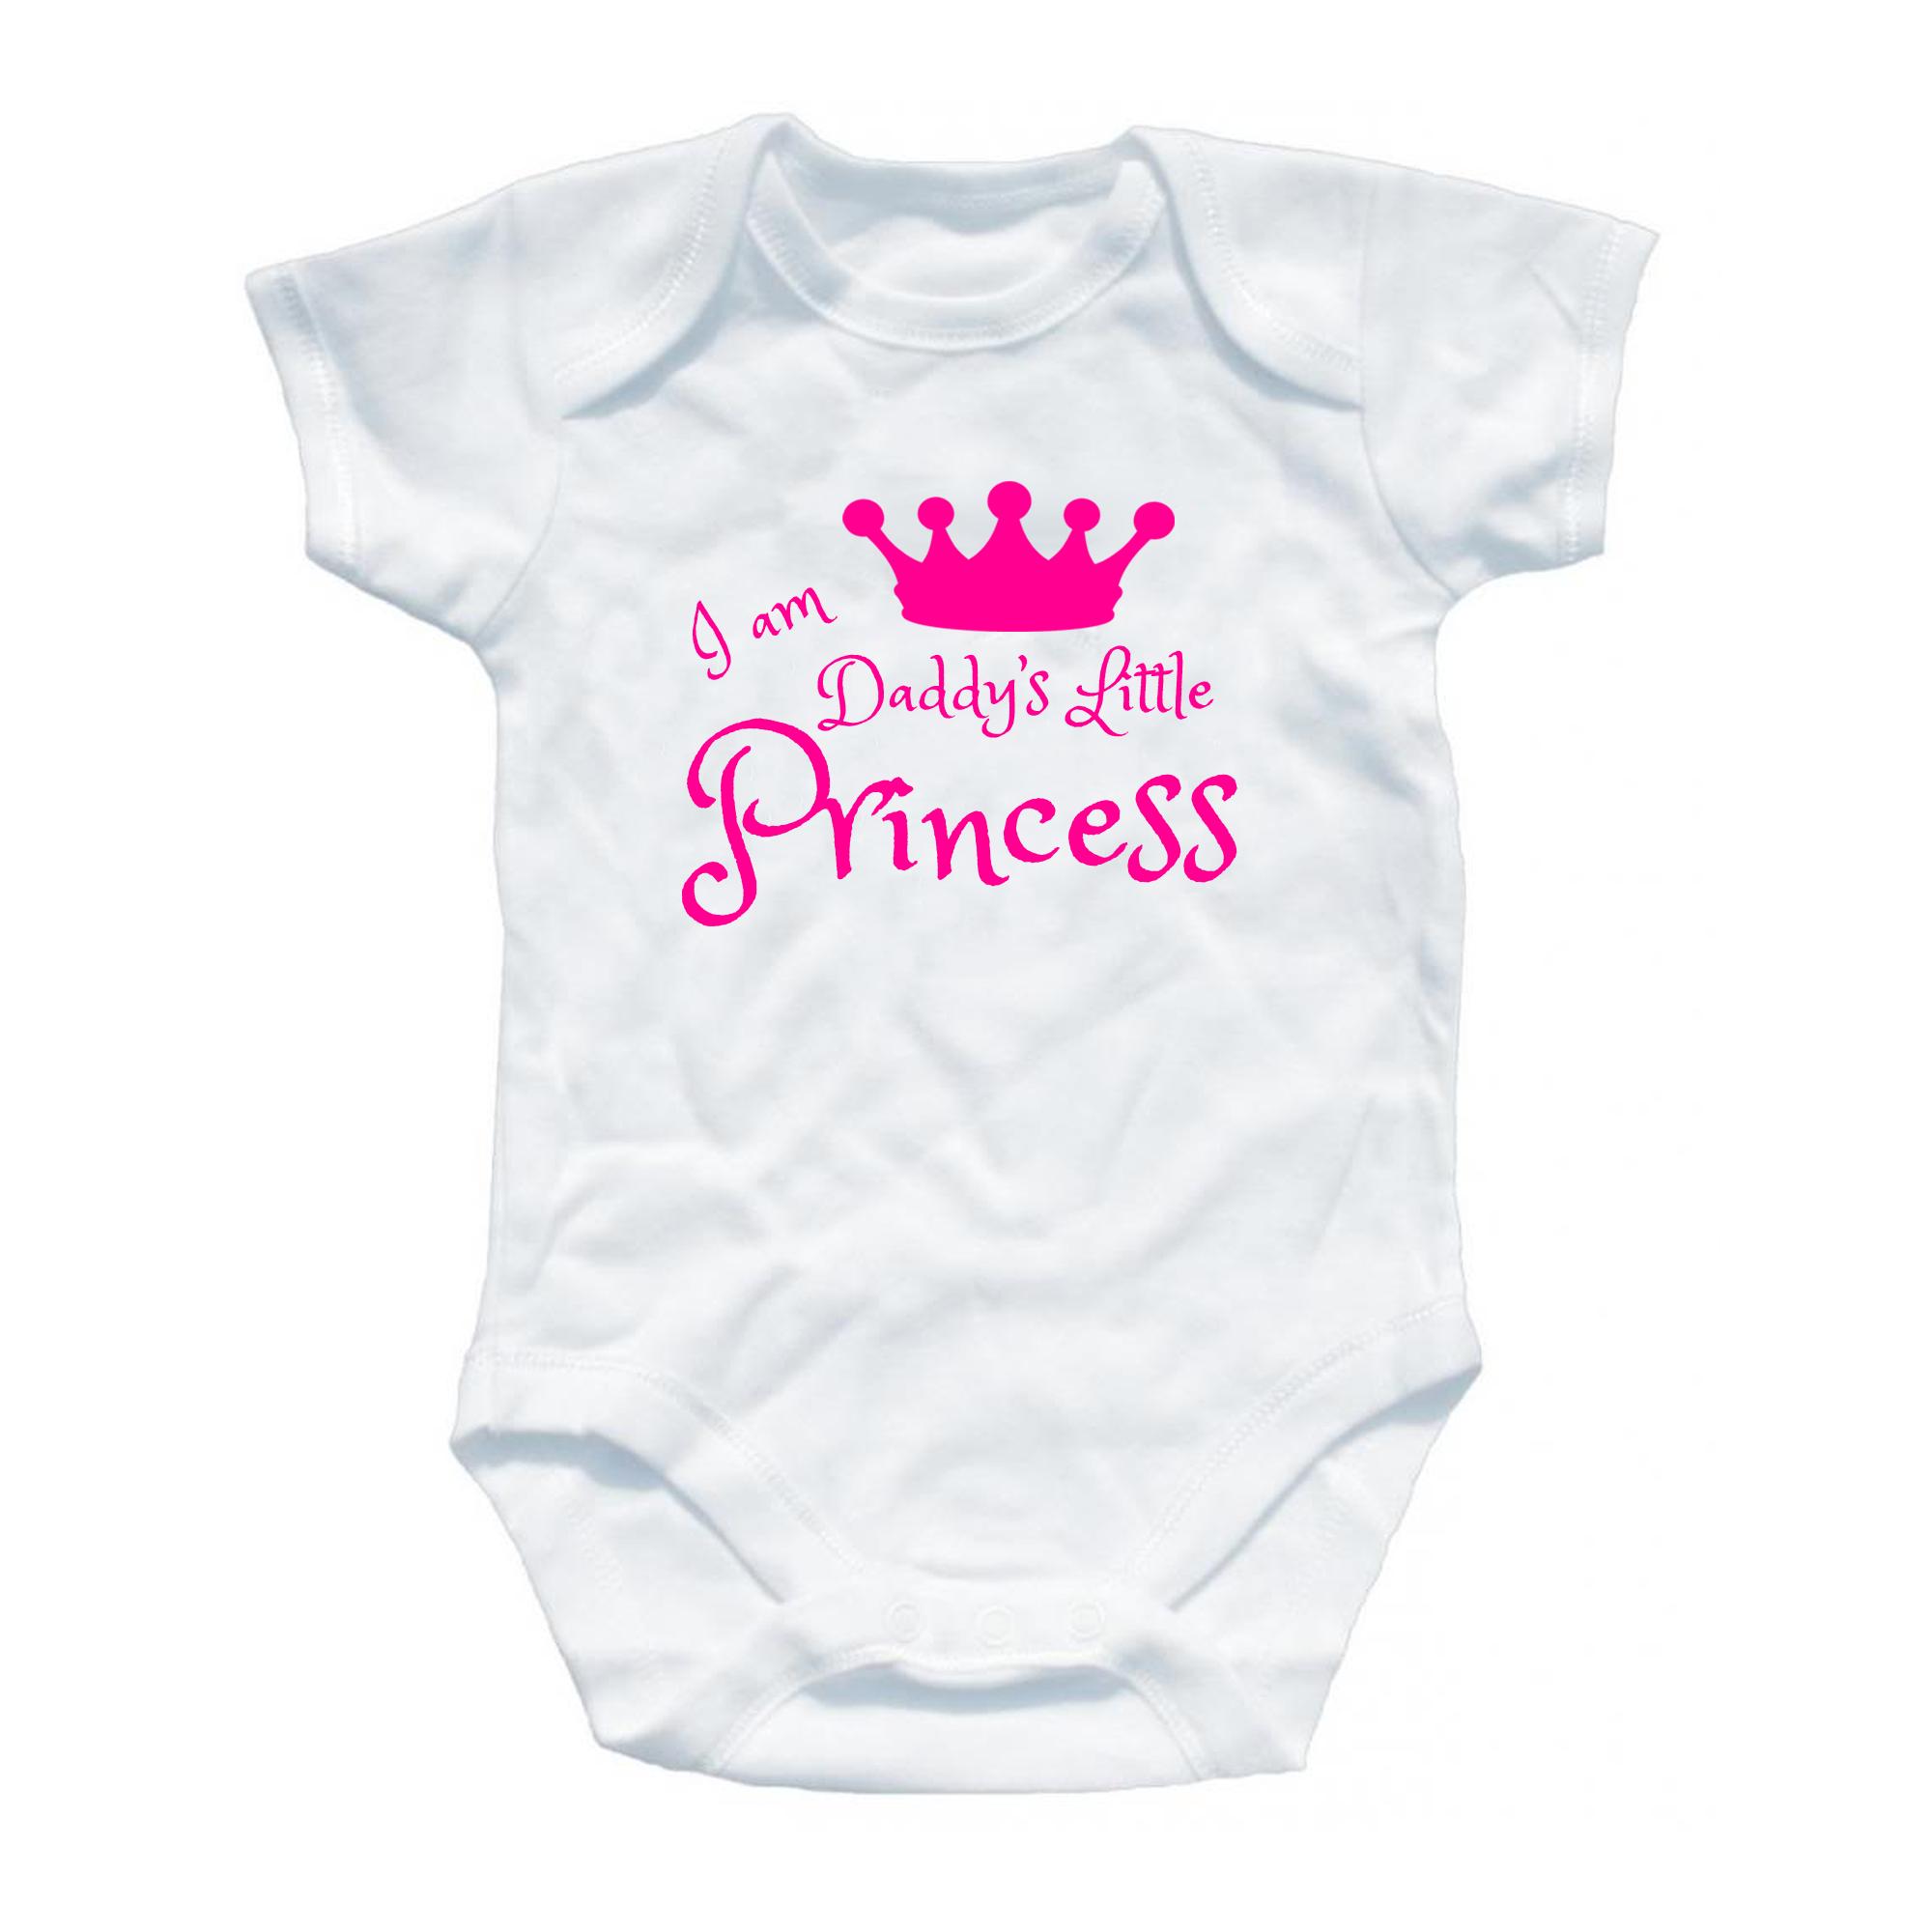 Daddy s Princess Baby Grow Funny Gift Present Boys Girls esie All